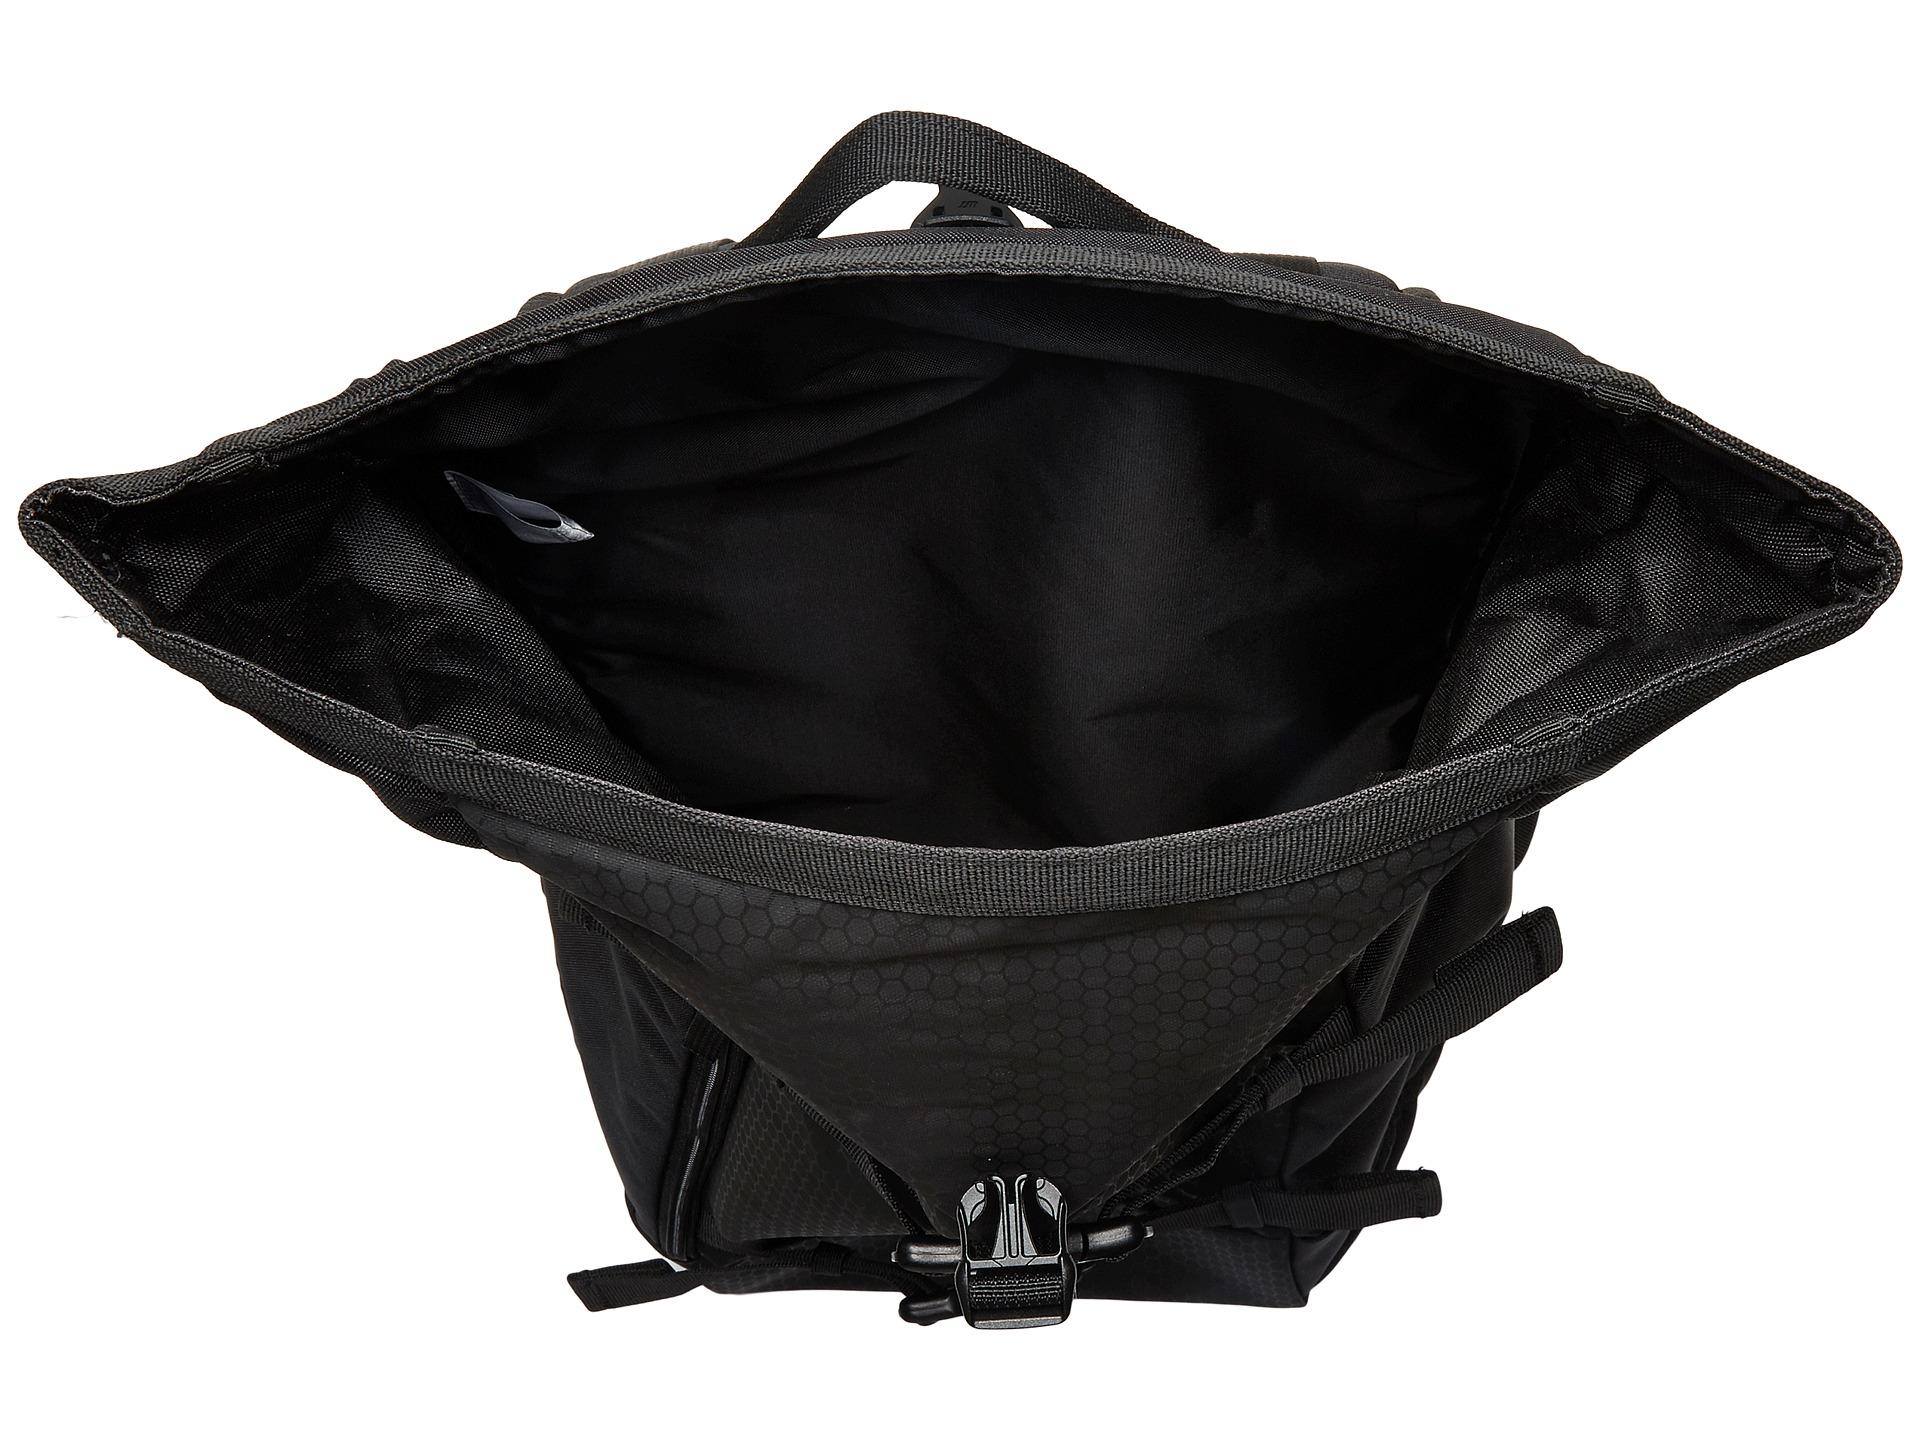 283e8c896a3 adidas Originals Originals Action Sports Skate Strap Backpack in Black for  Men - Lyst